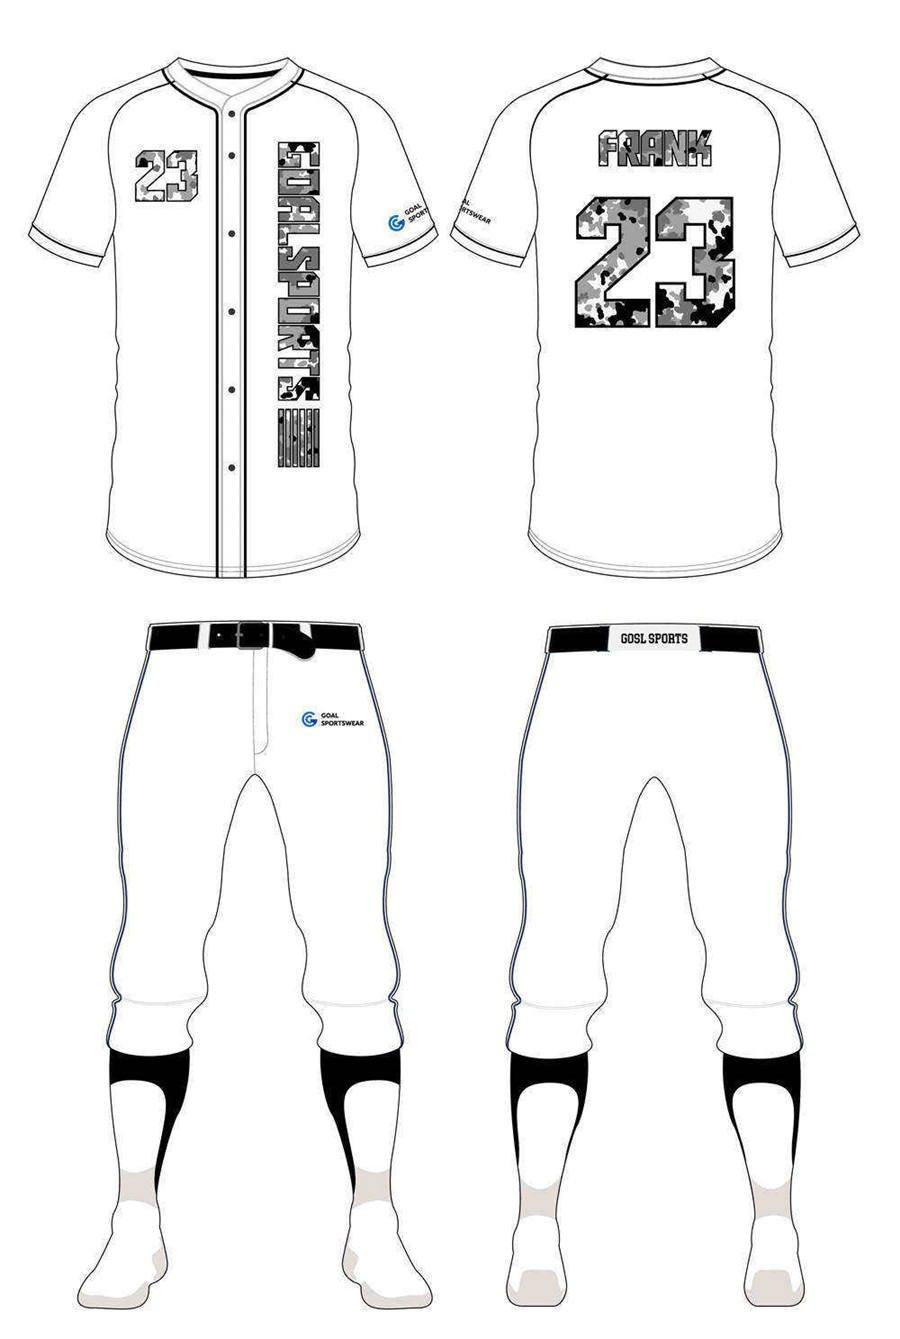 Full dye sublimation wholesale custom custom camo baseball jersey